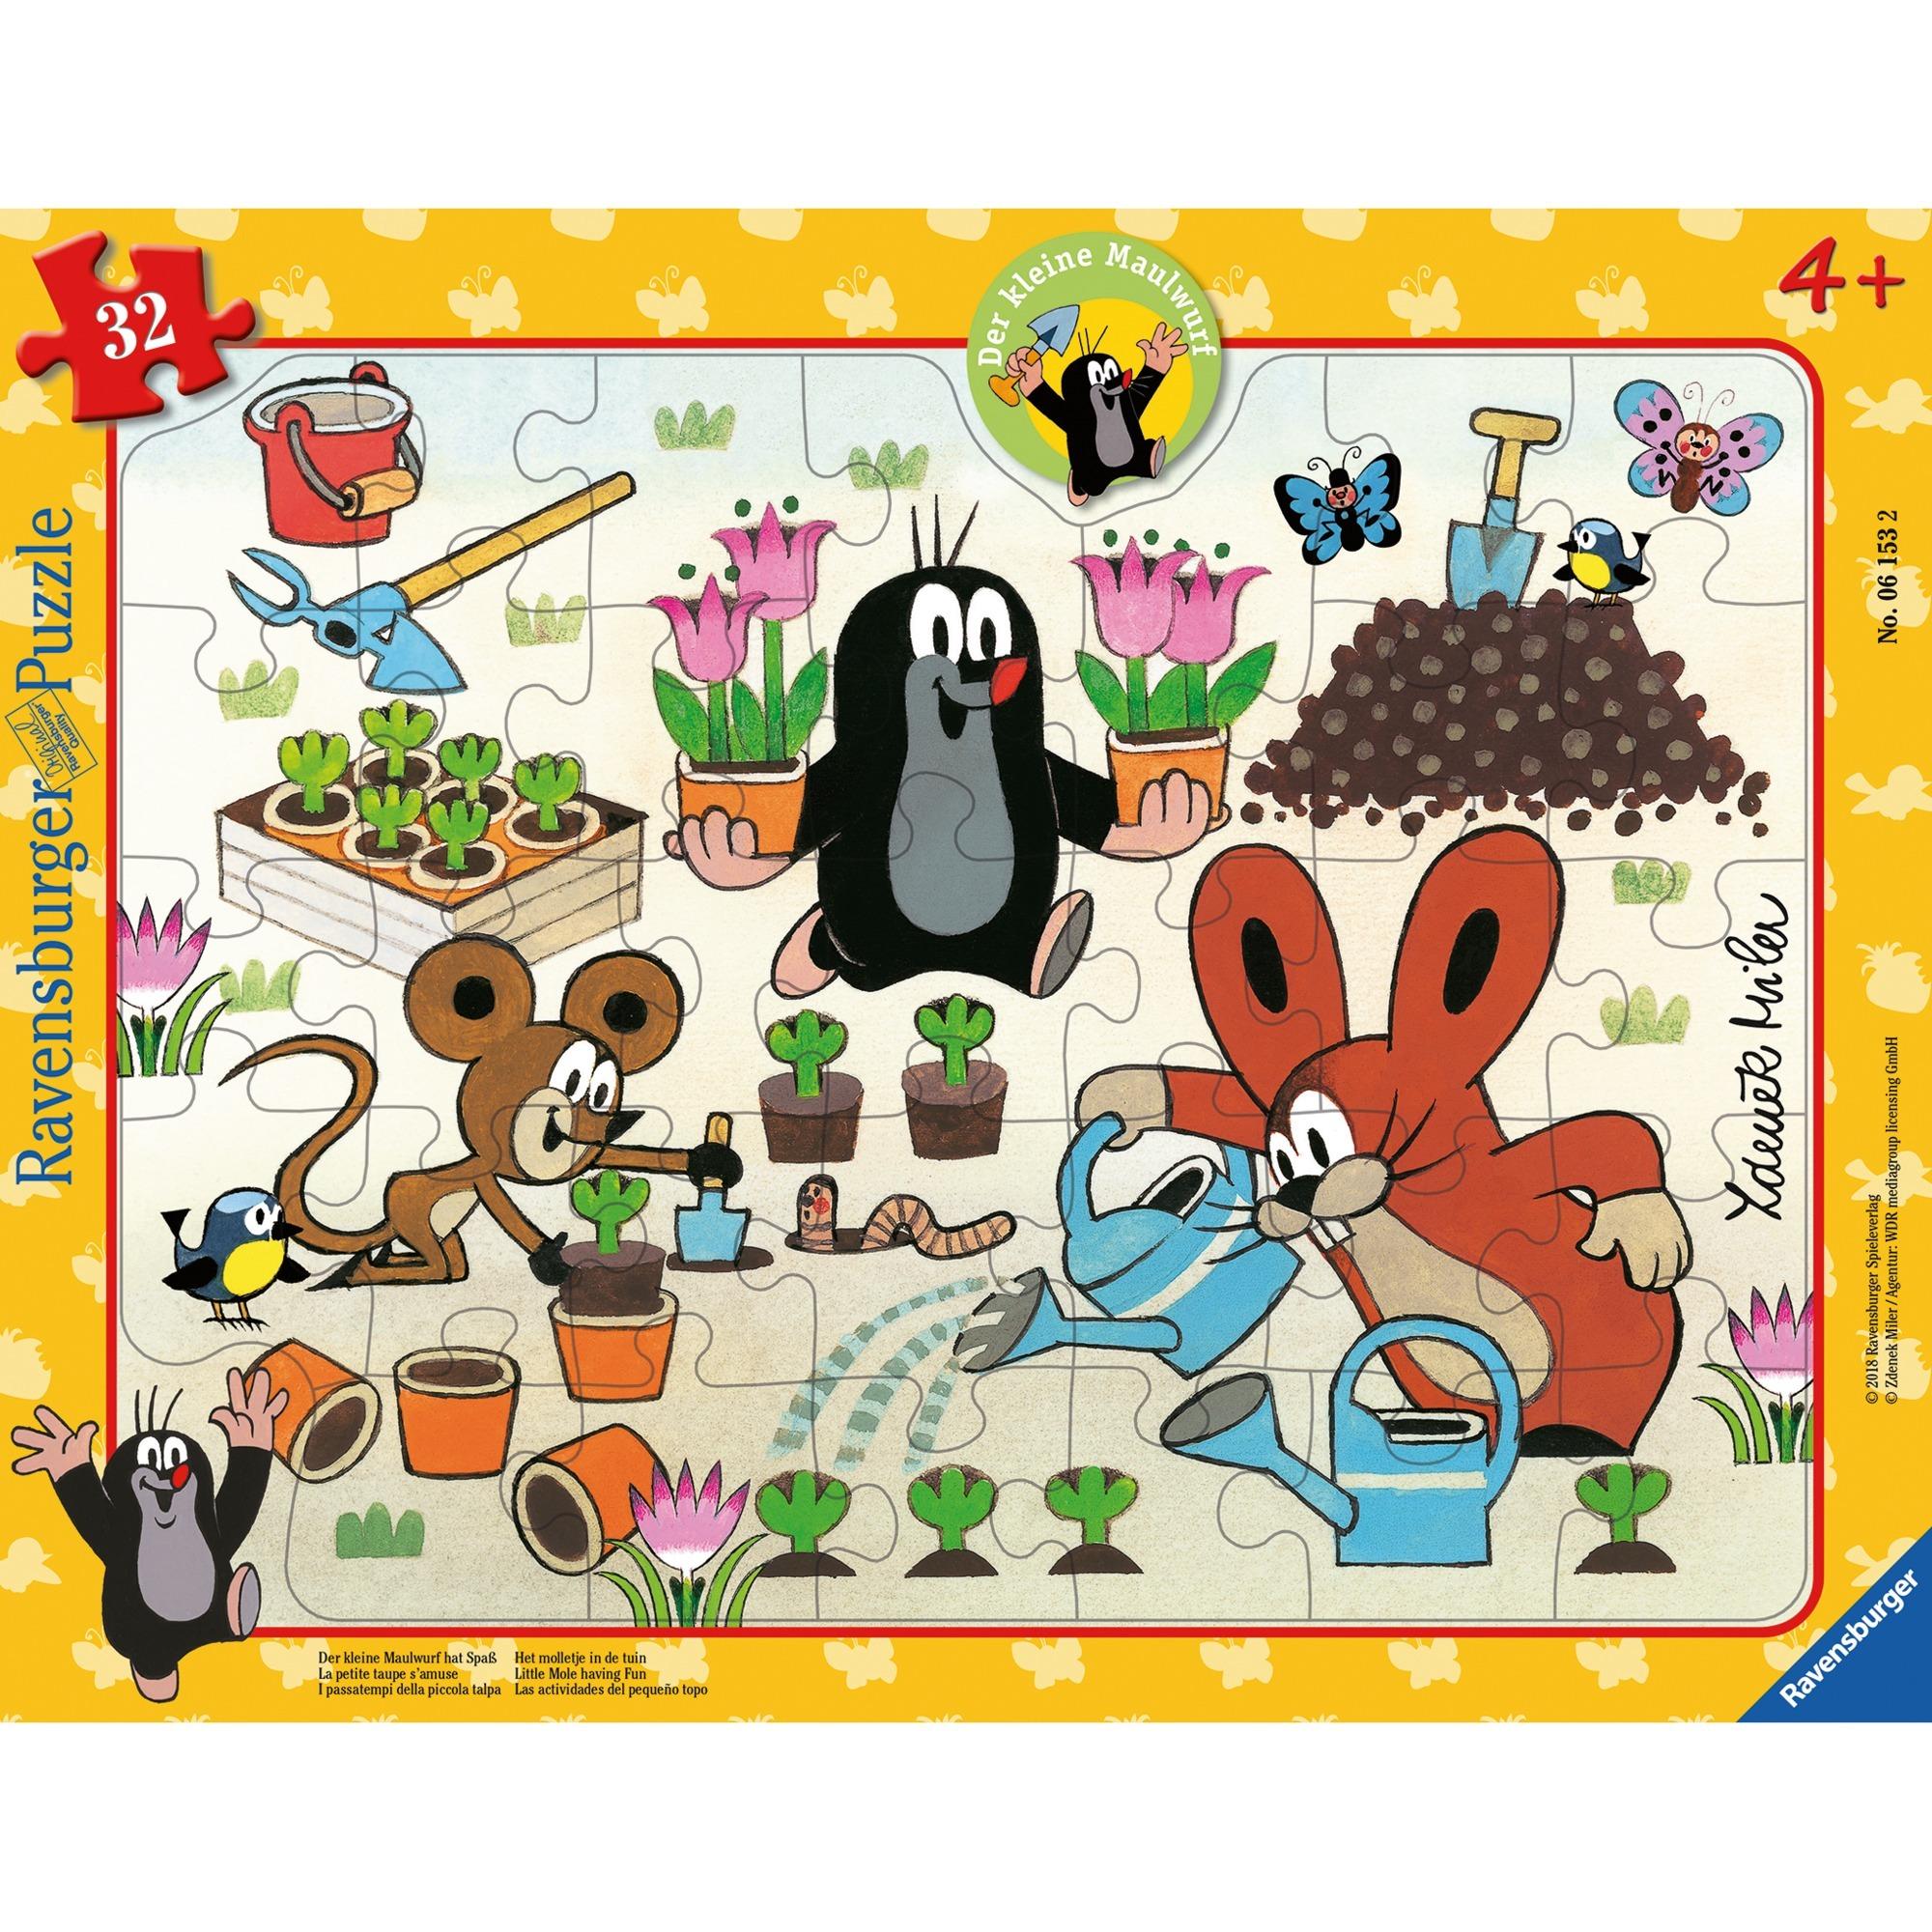 00.006.153 puzzle 32 pieza(s)